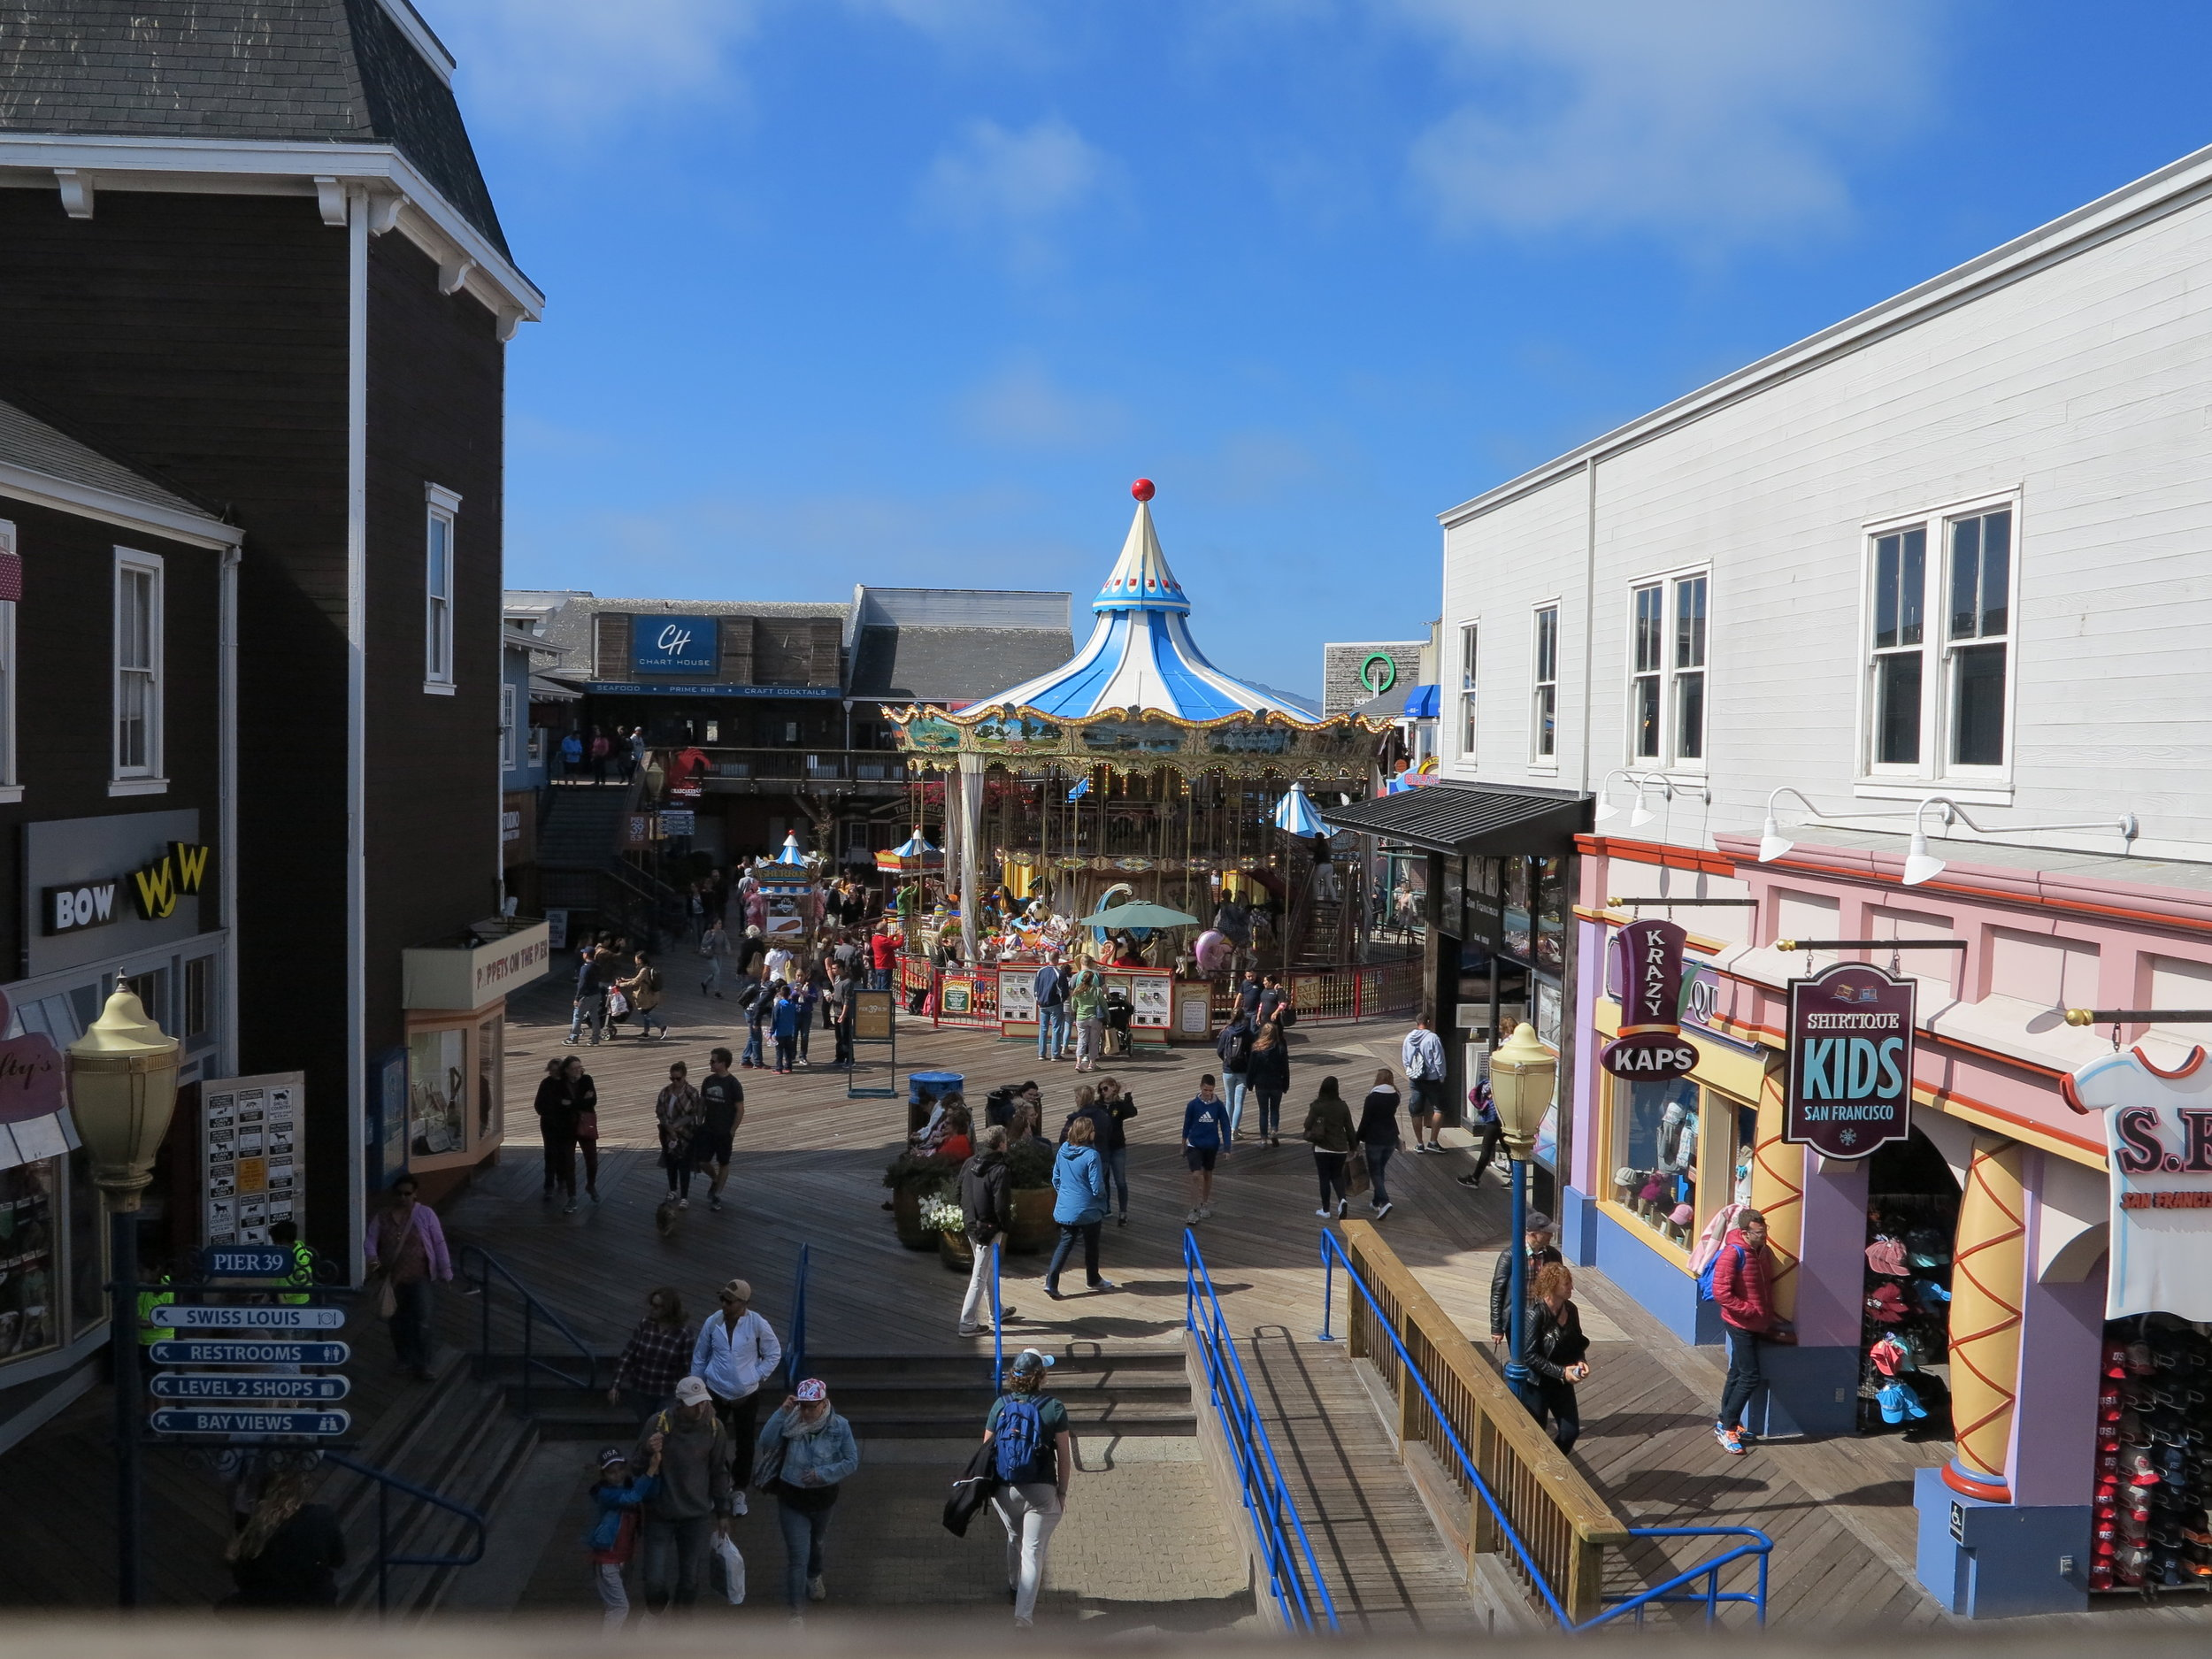 Carnival at Pier 39.